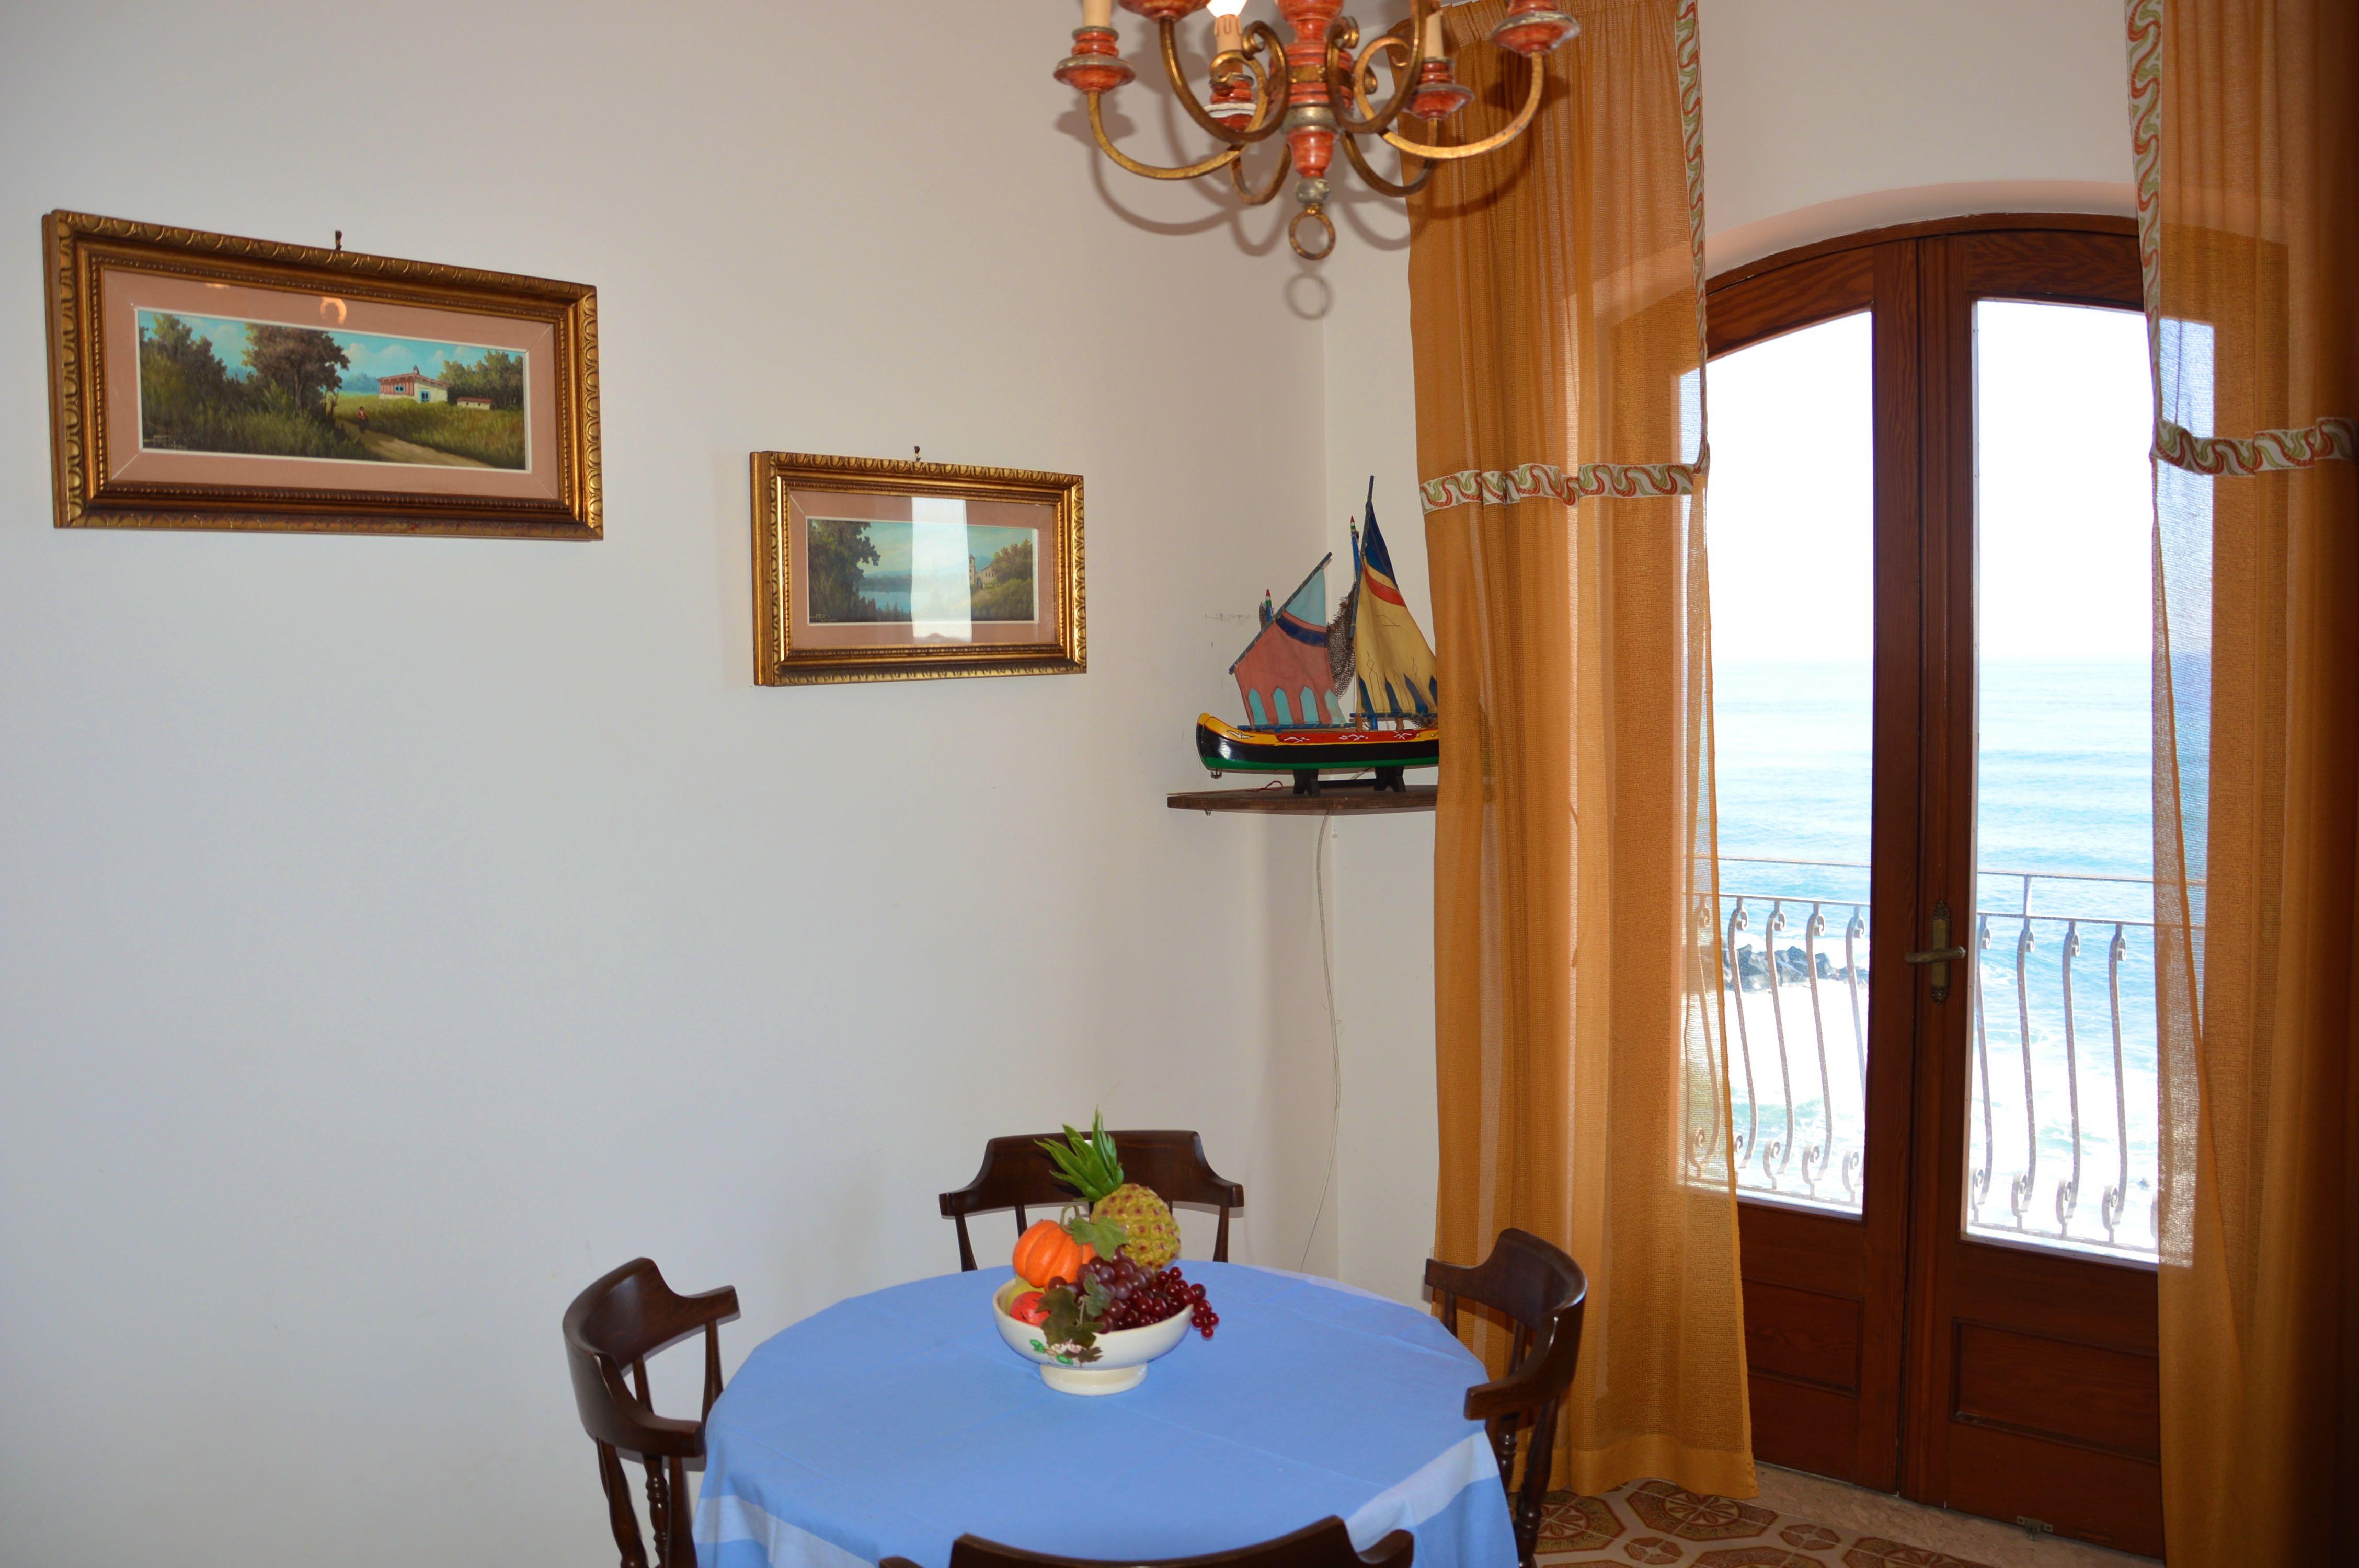 Holiday apartment Casa Camelia - Apartment in front of the beach in Giardini Naxos (1976978), Giardini Naxos, Messina, Sicily, Italy, picture 7